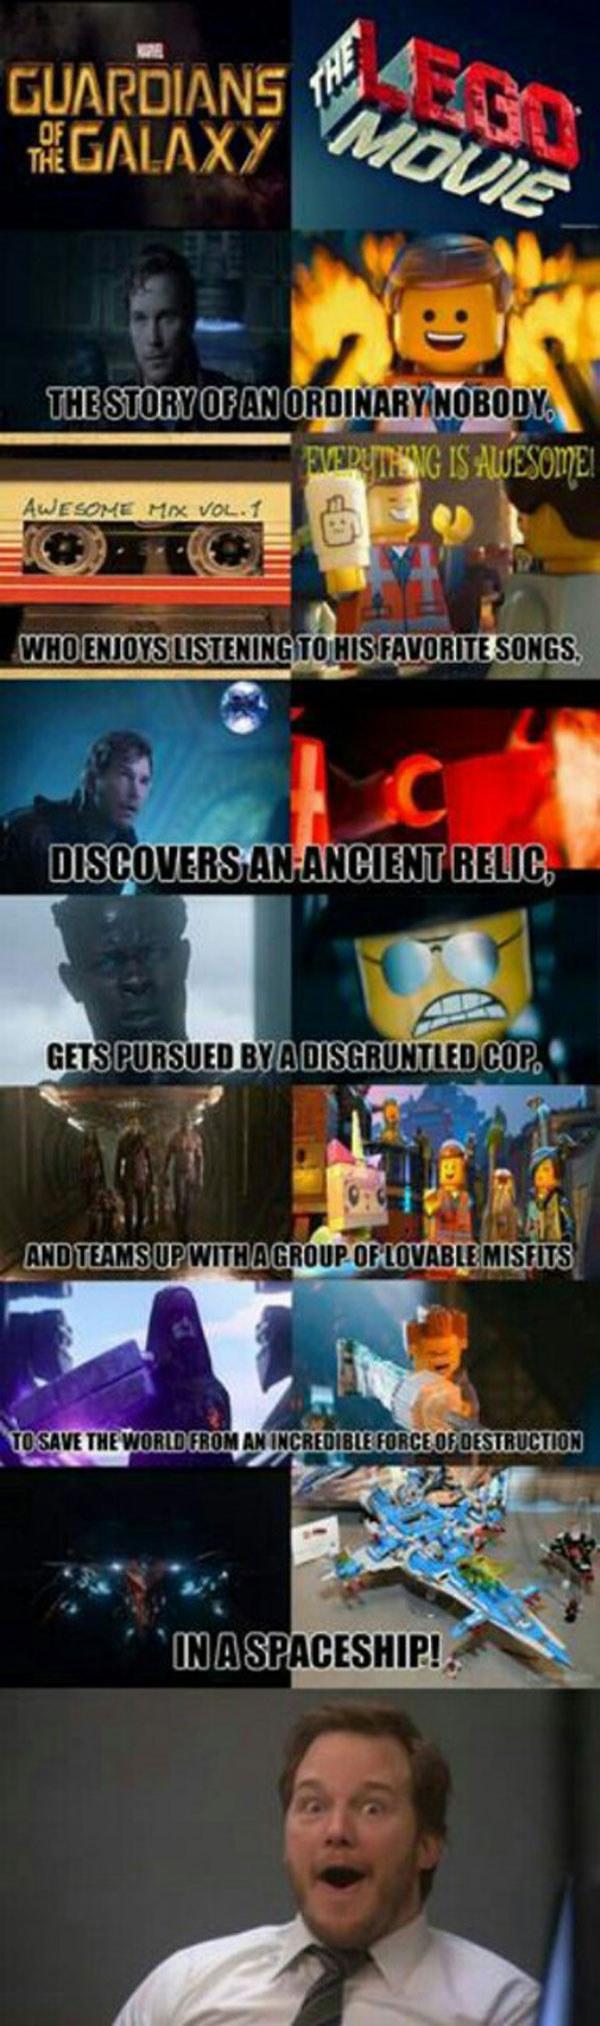 guardians-lego